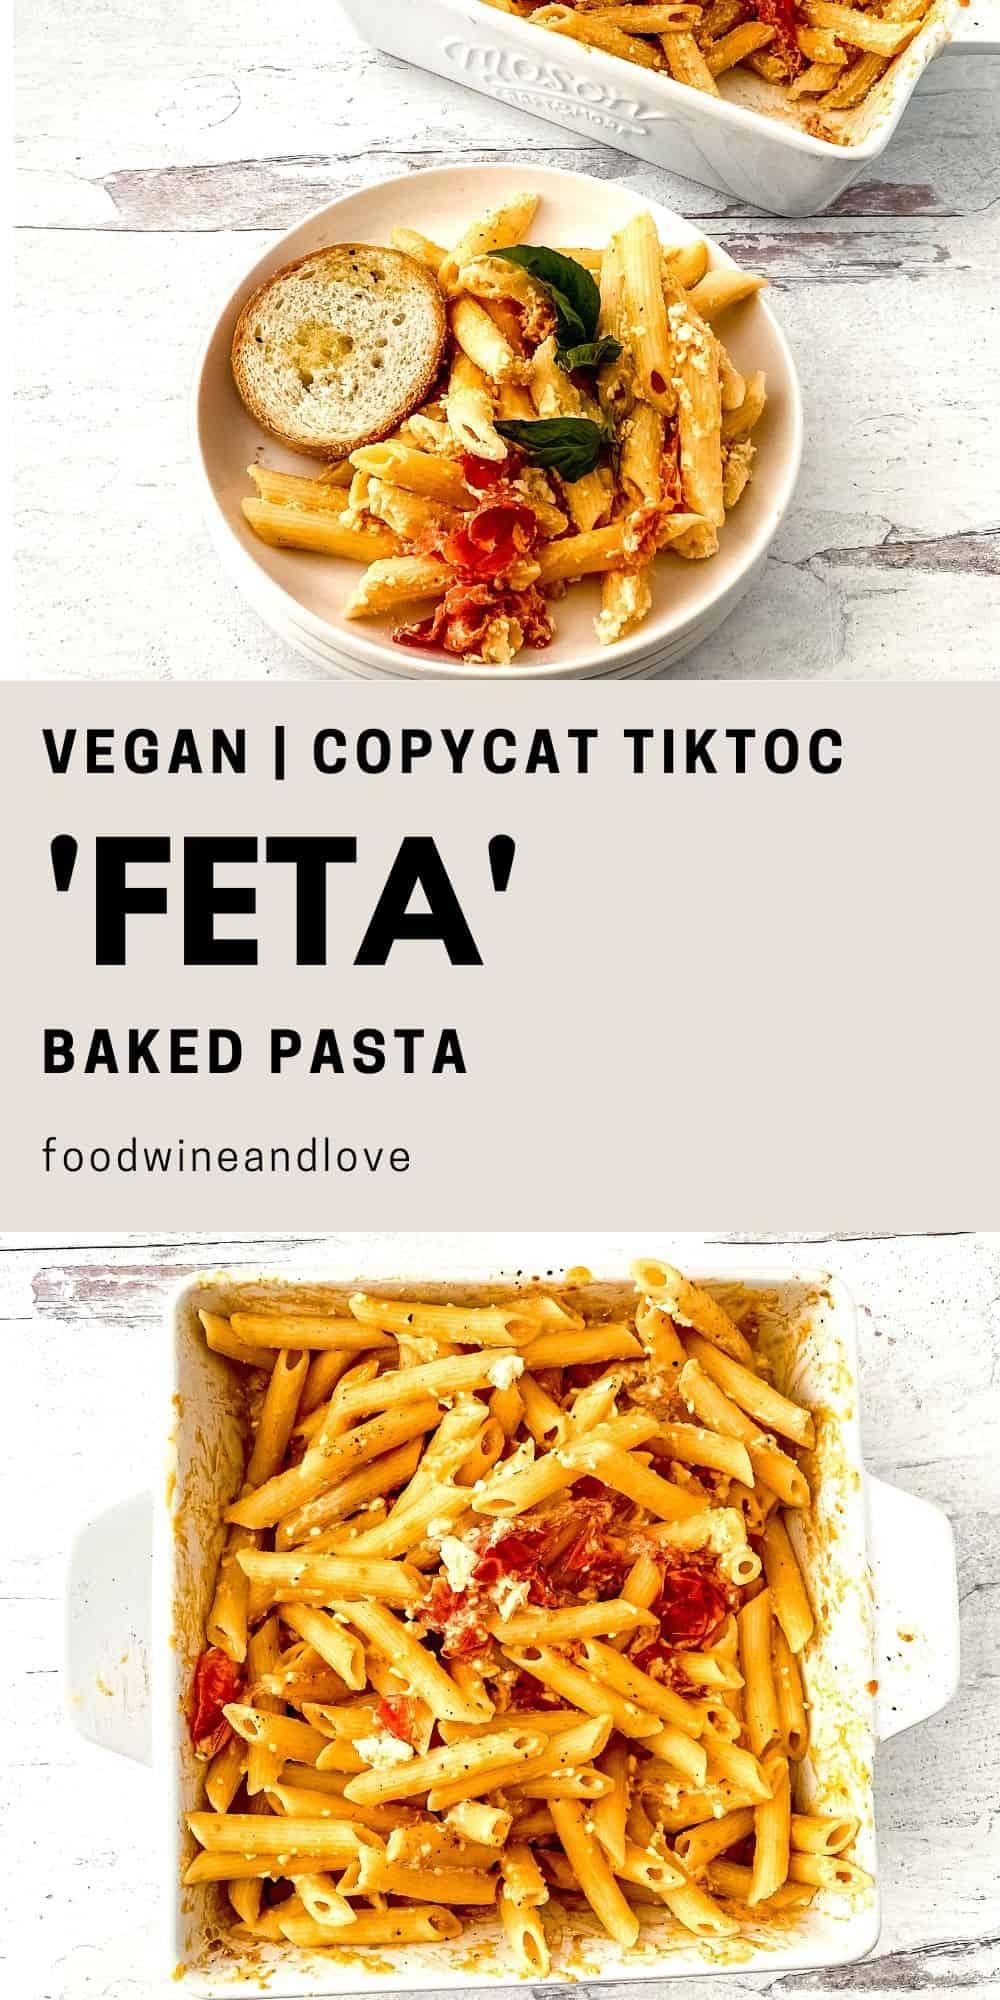 Baked Vegan Feta Pasta